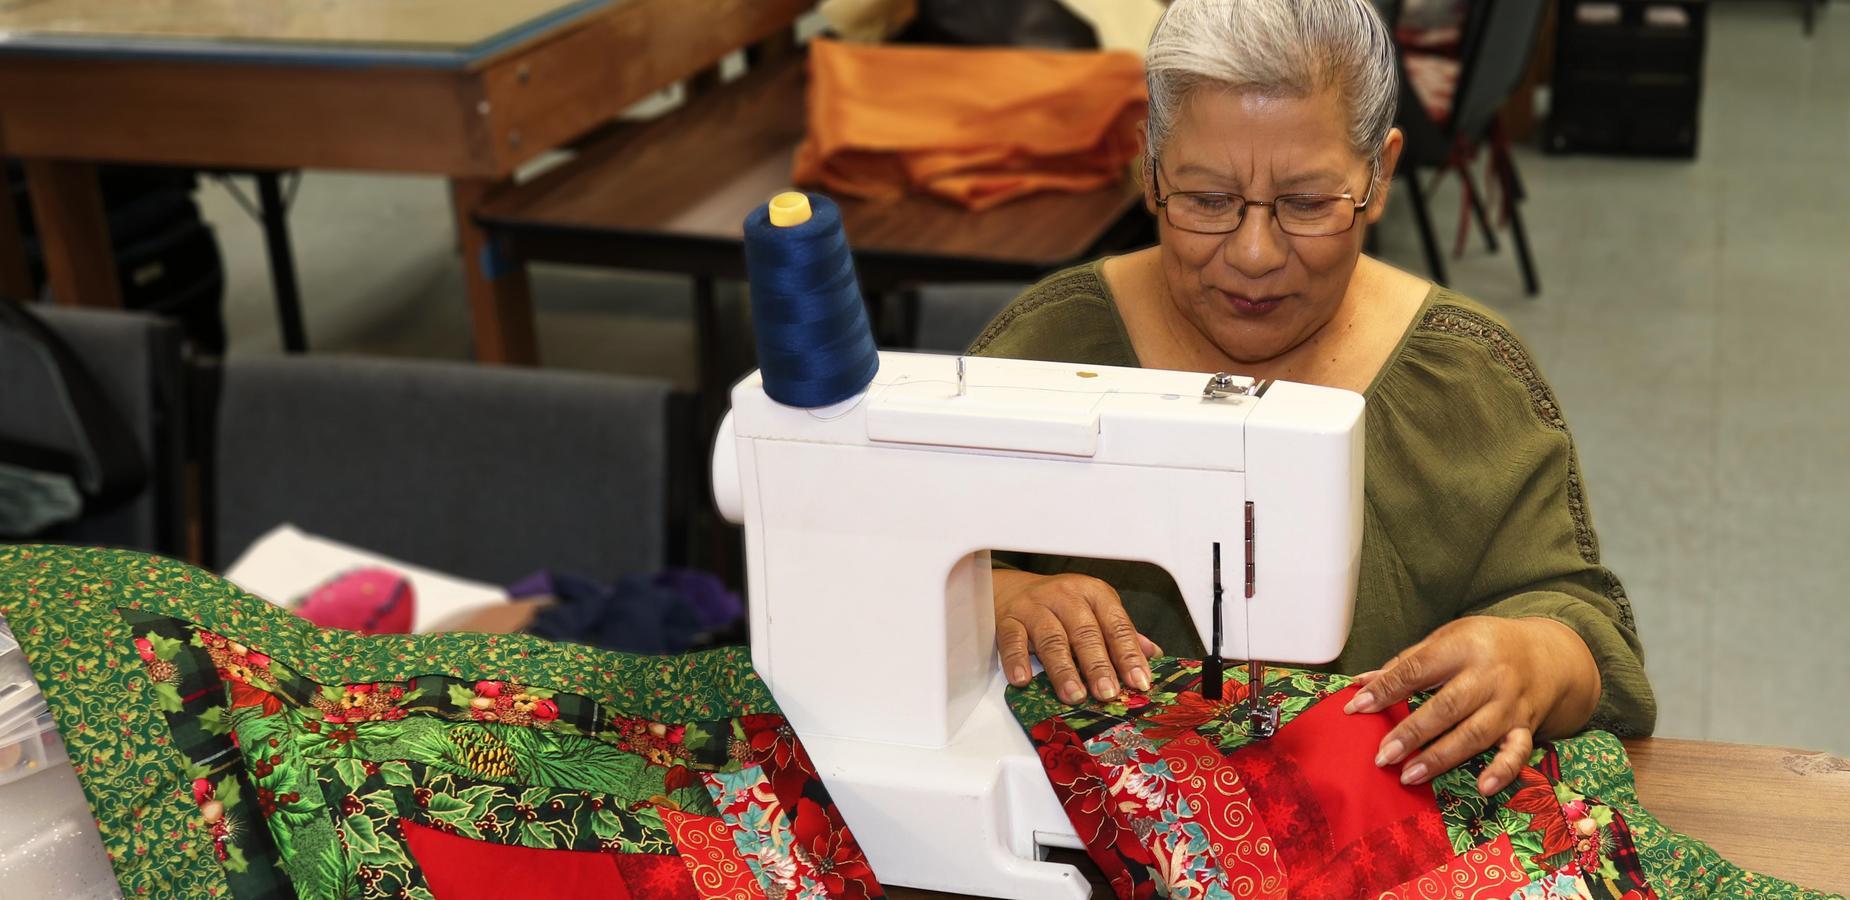 Sewing Program